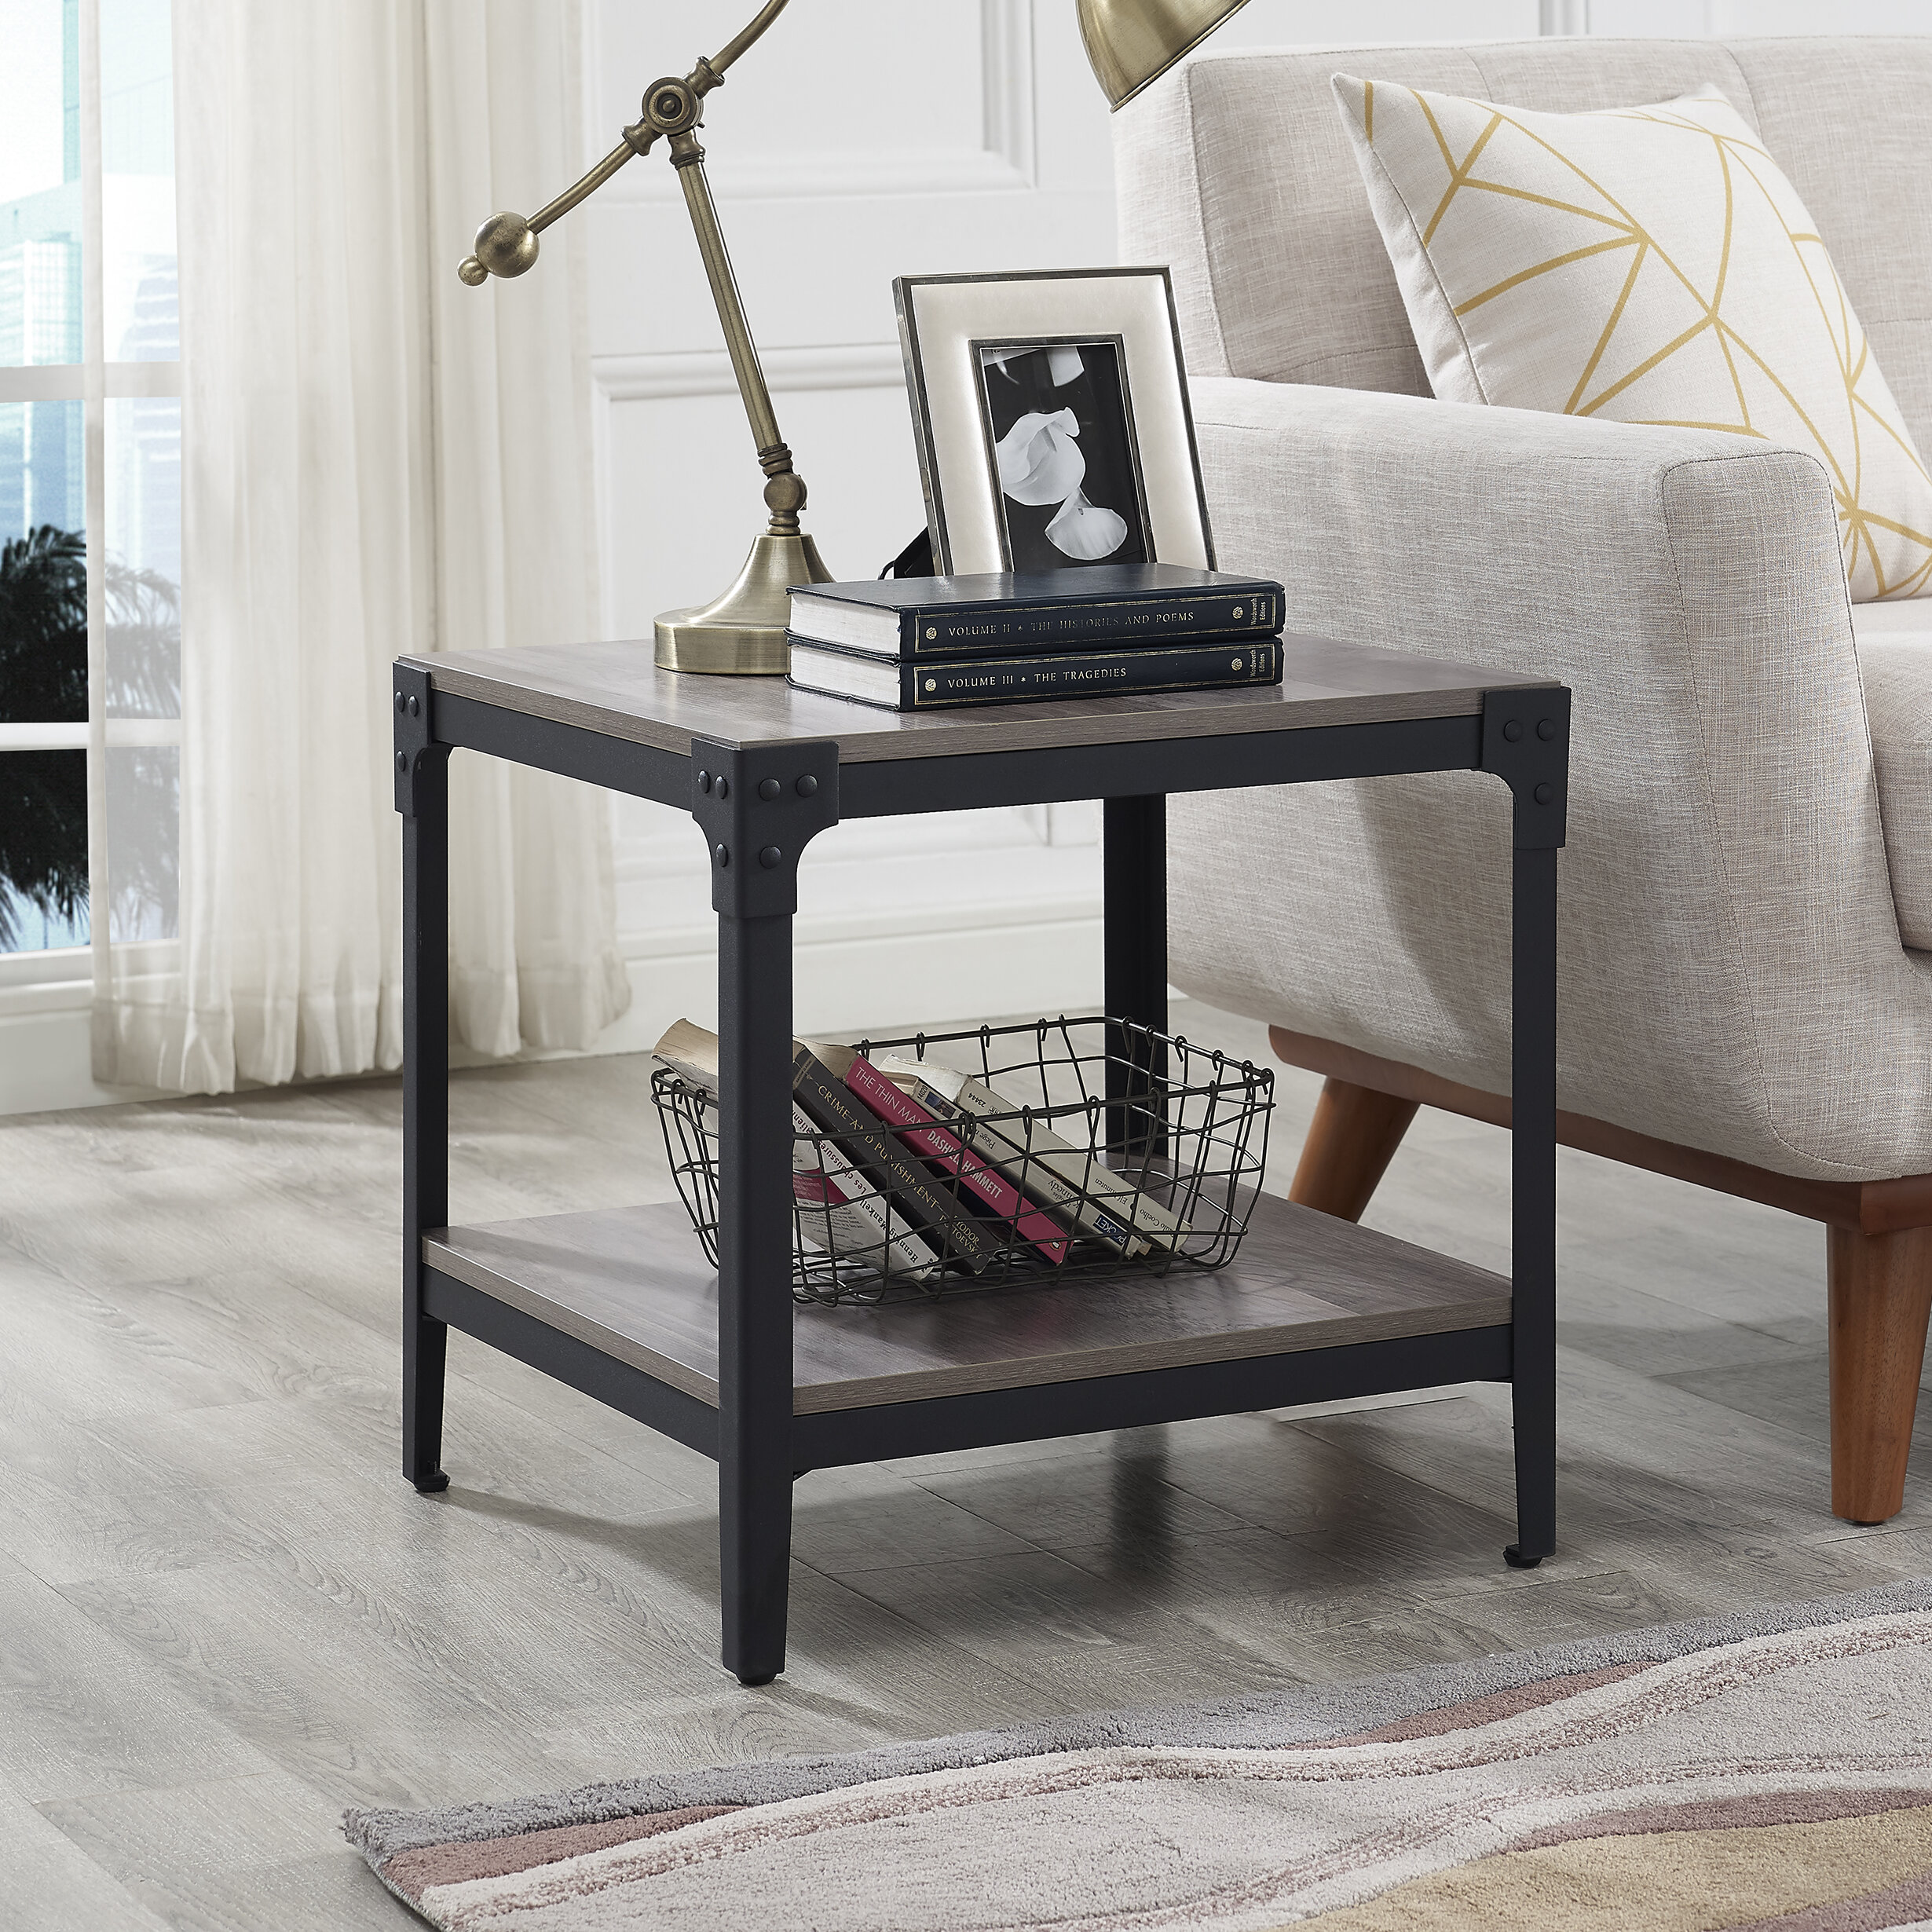 ff84e5ca619 Grey Wash Side Table